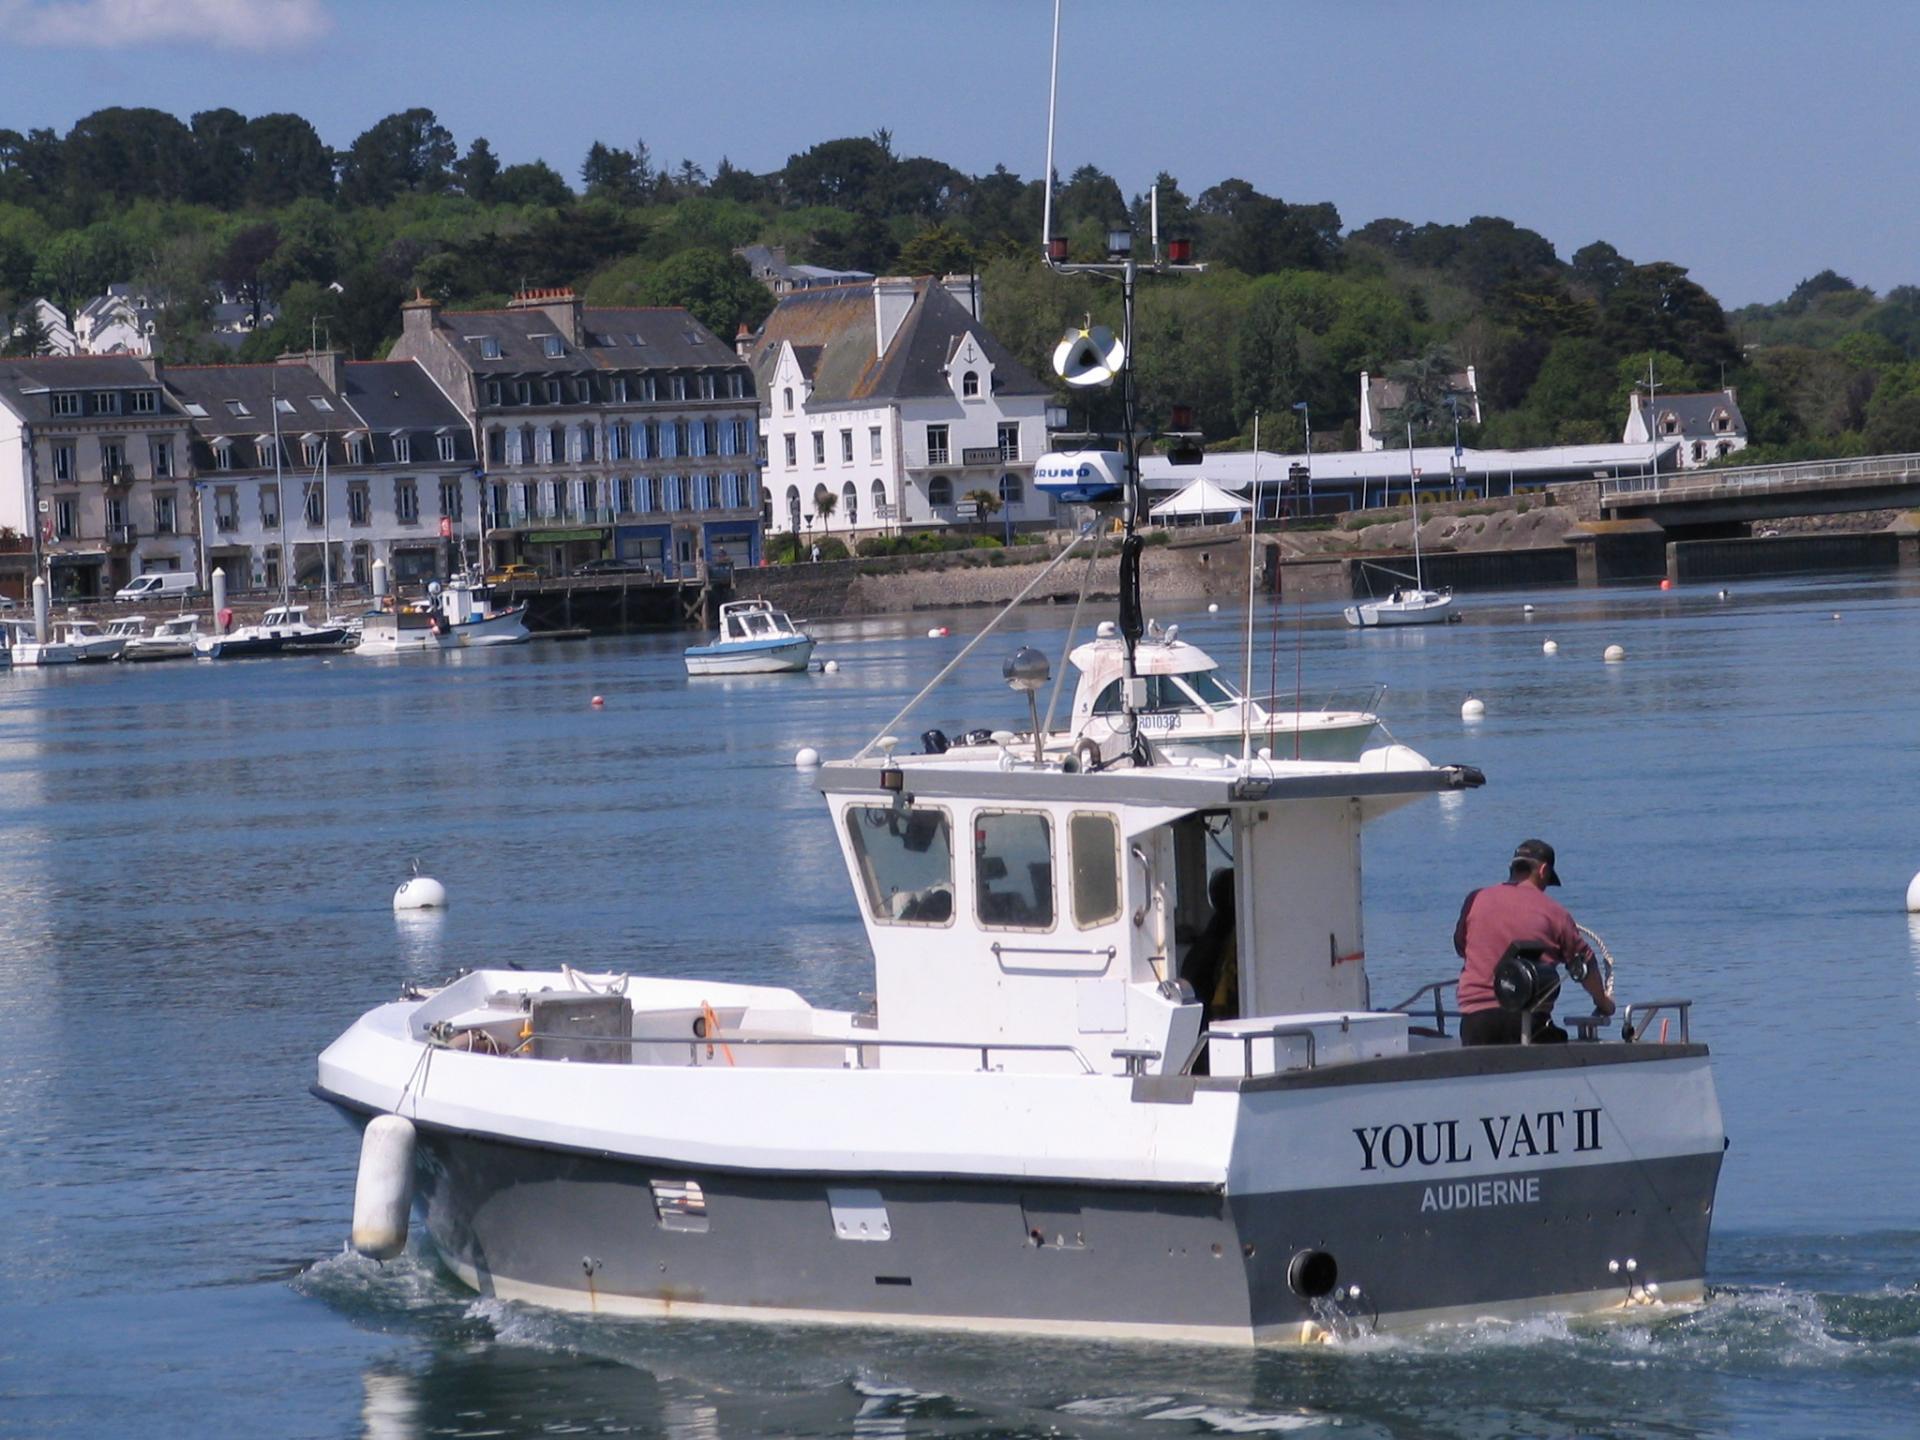 200508 youl vat ii port h